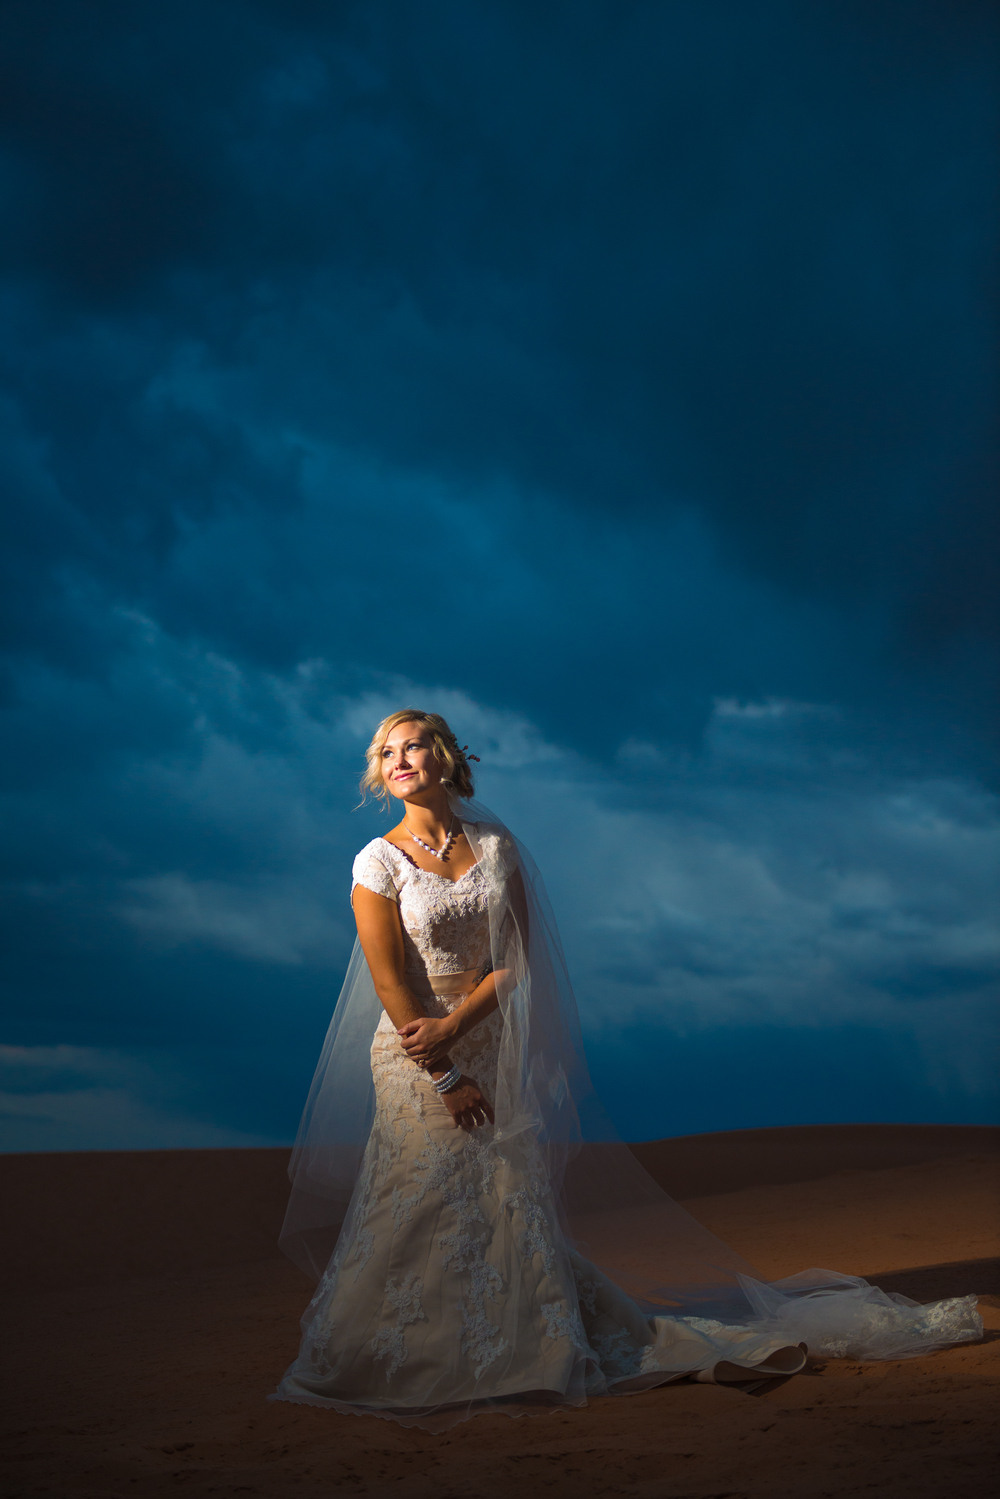 photographybyjamileavitt_wedding_gallery_main-14.jpg